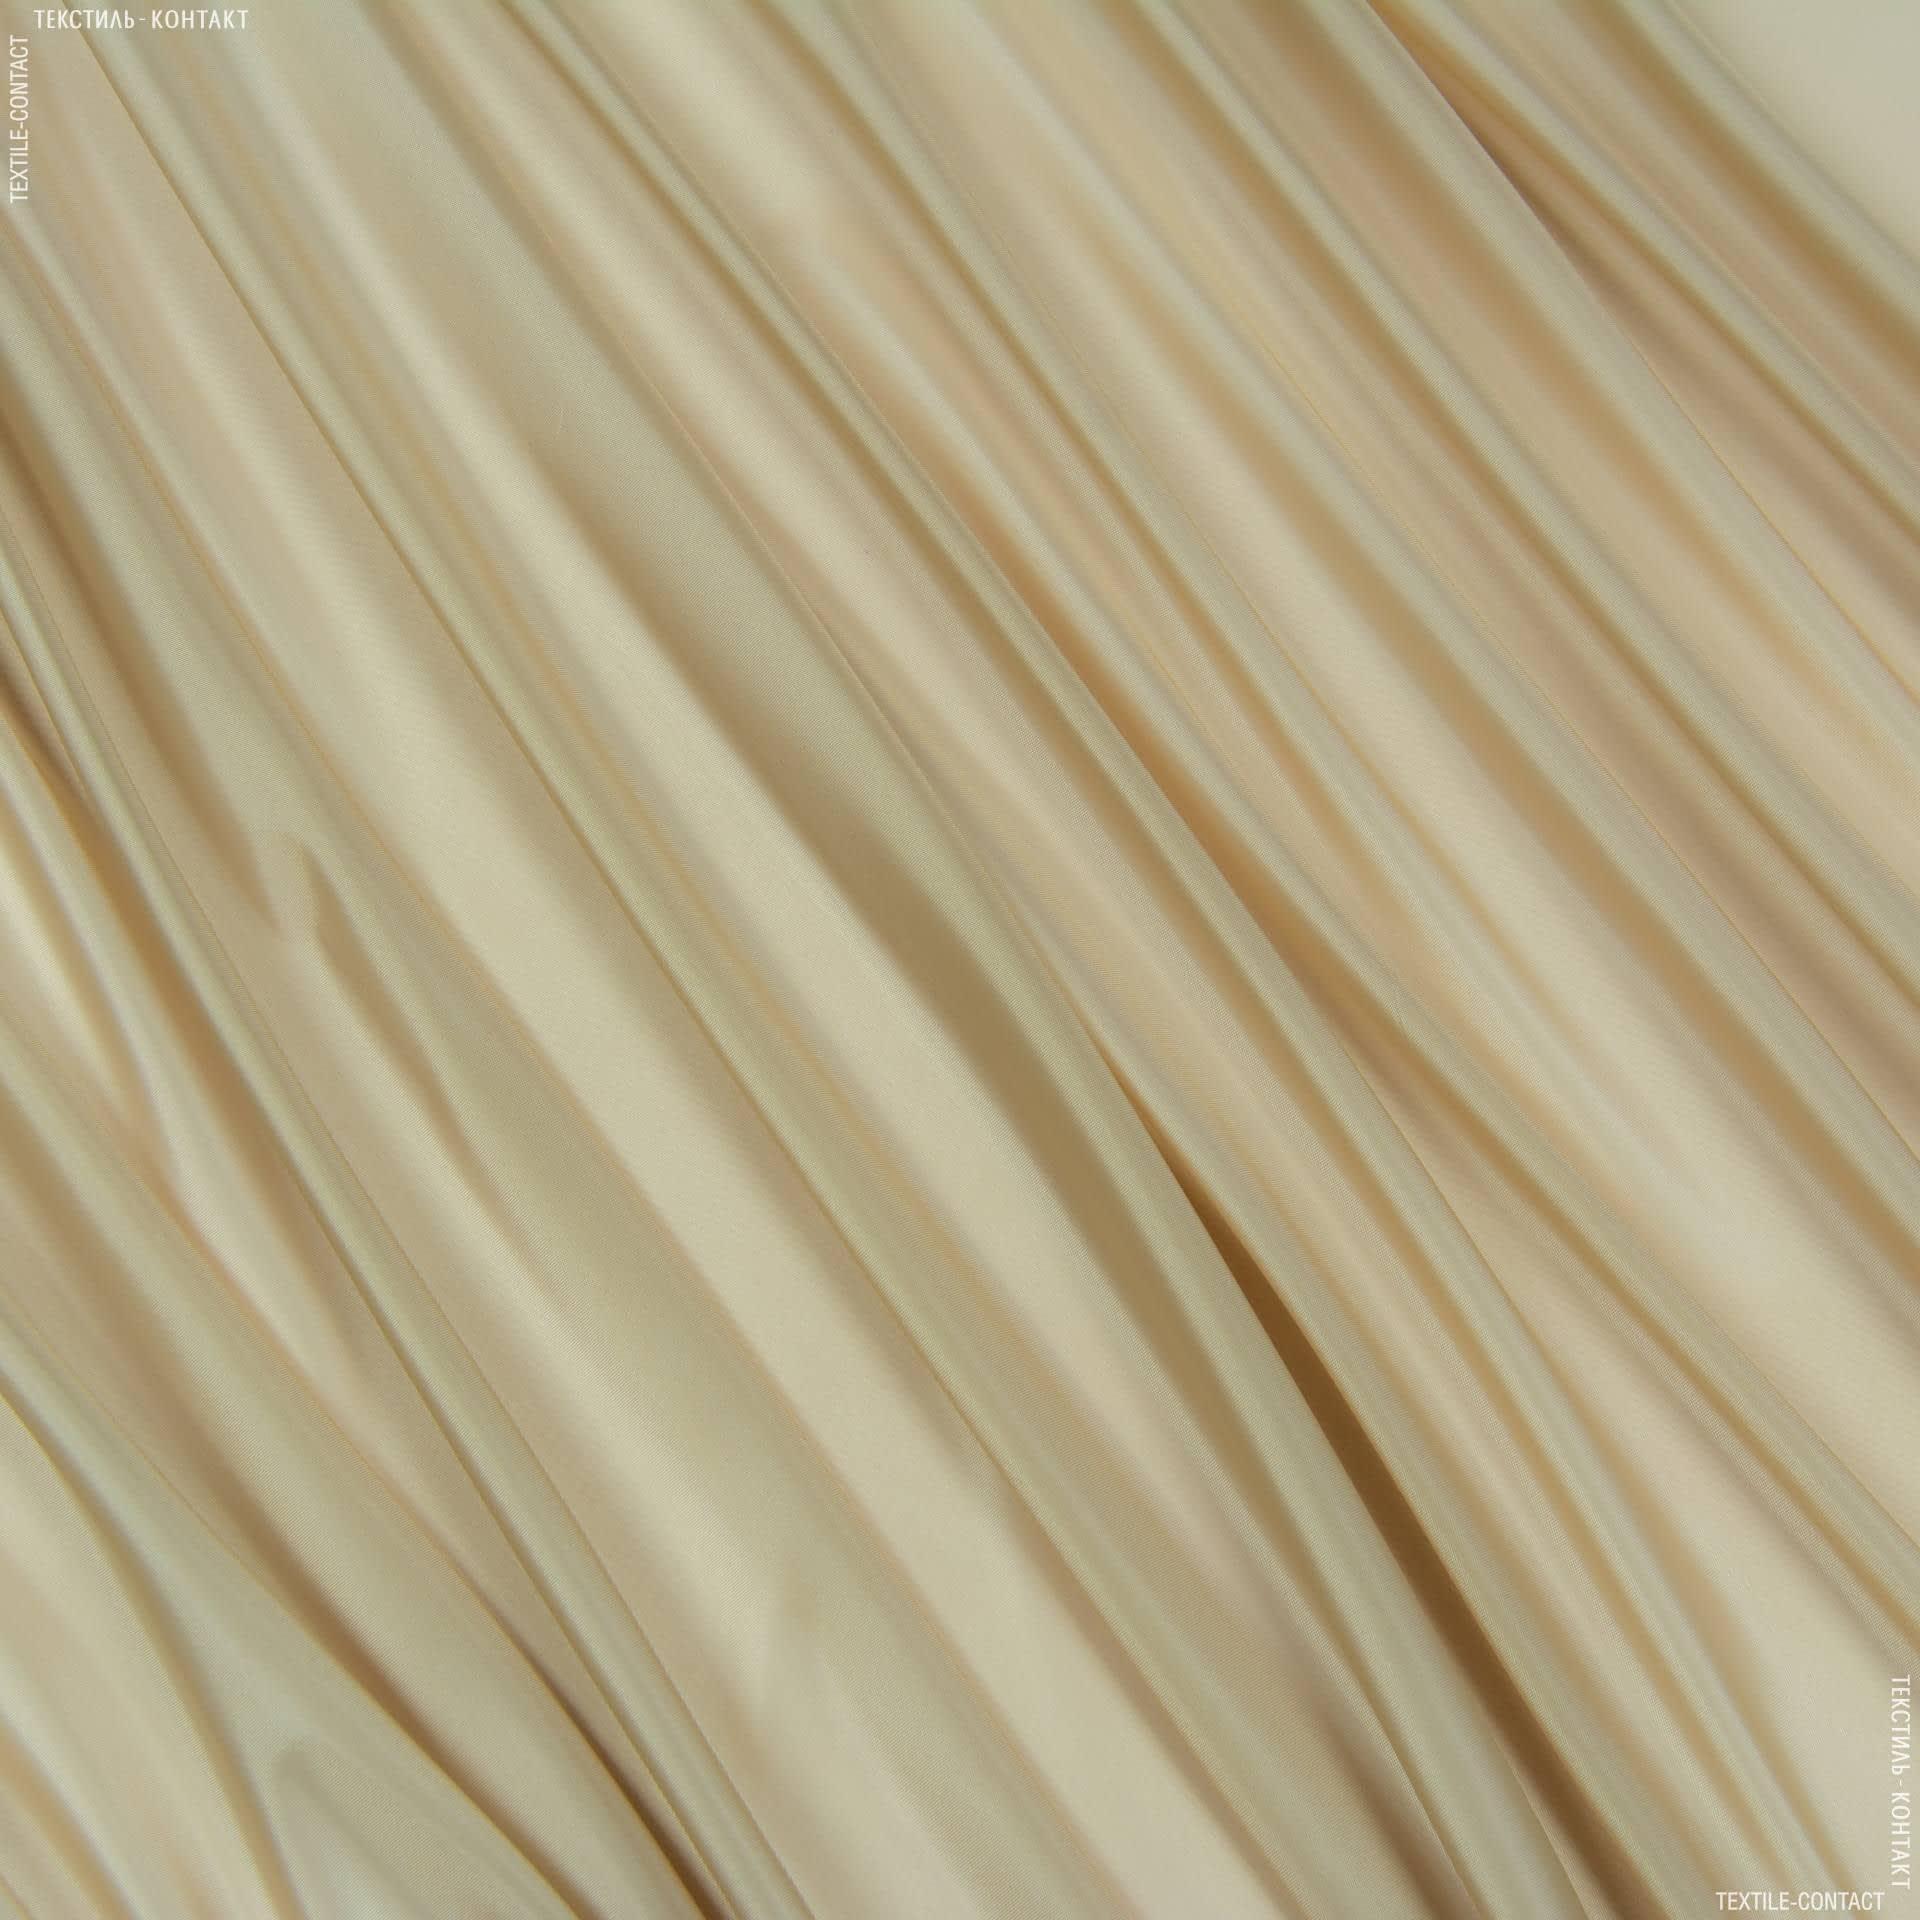 Ткани подкладочная ткань - Подкладочная 190т светло-бежевый